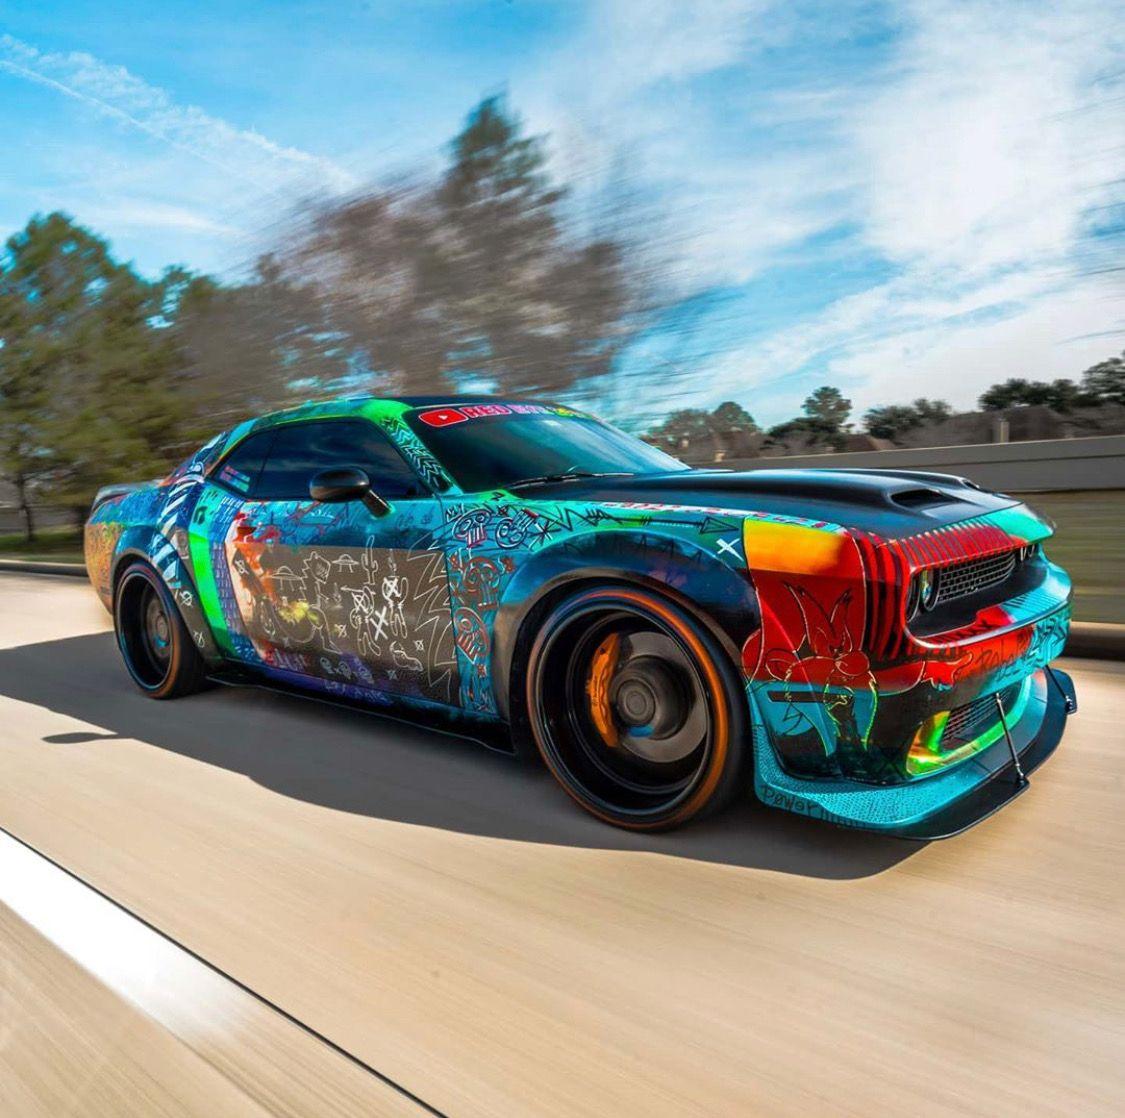 20 Dodge Chalenger Ideas Dodge Challenger Dodge Dodge Challenger Hellcat